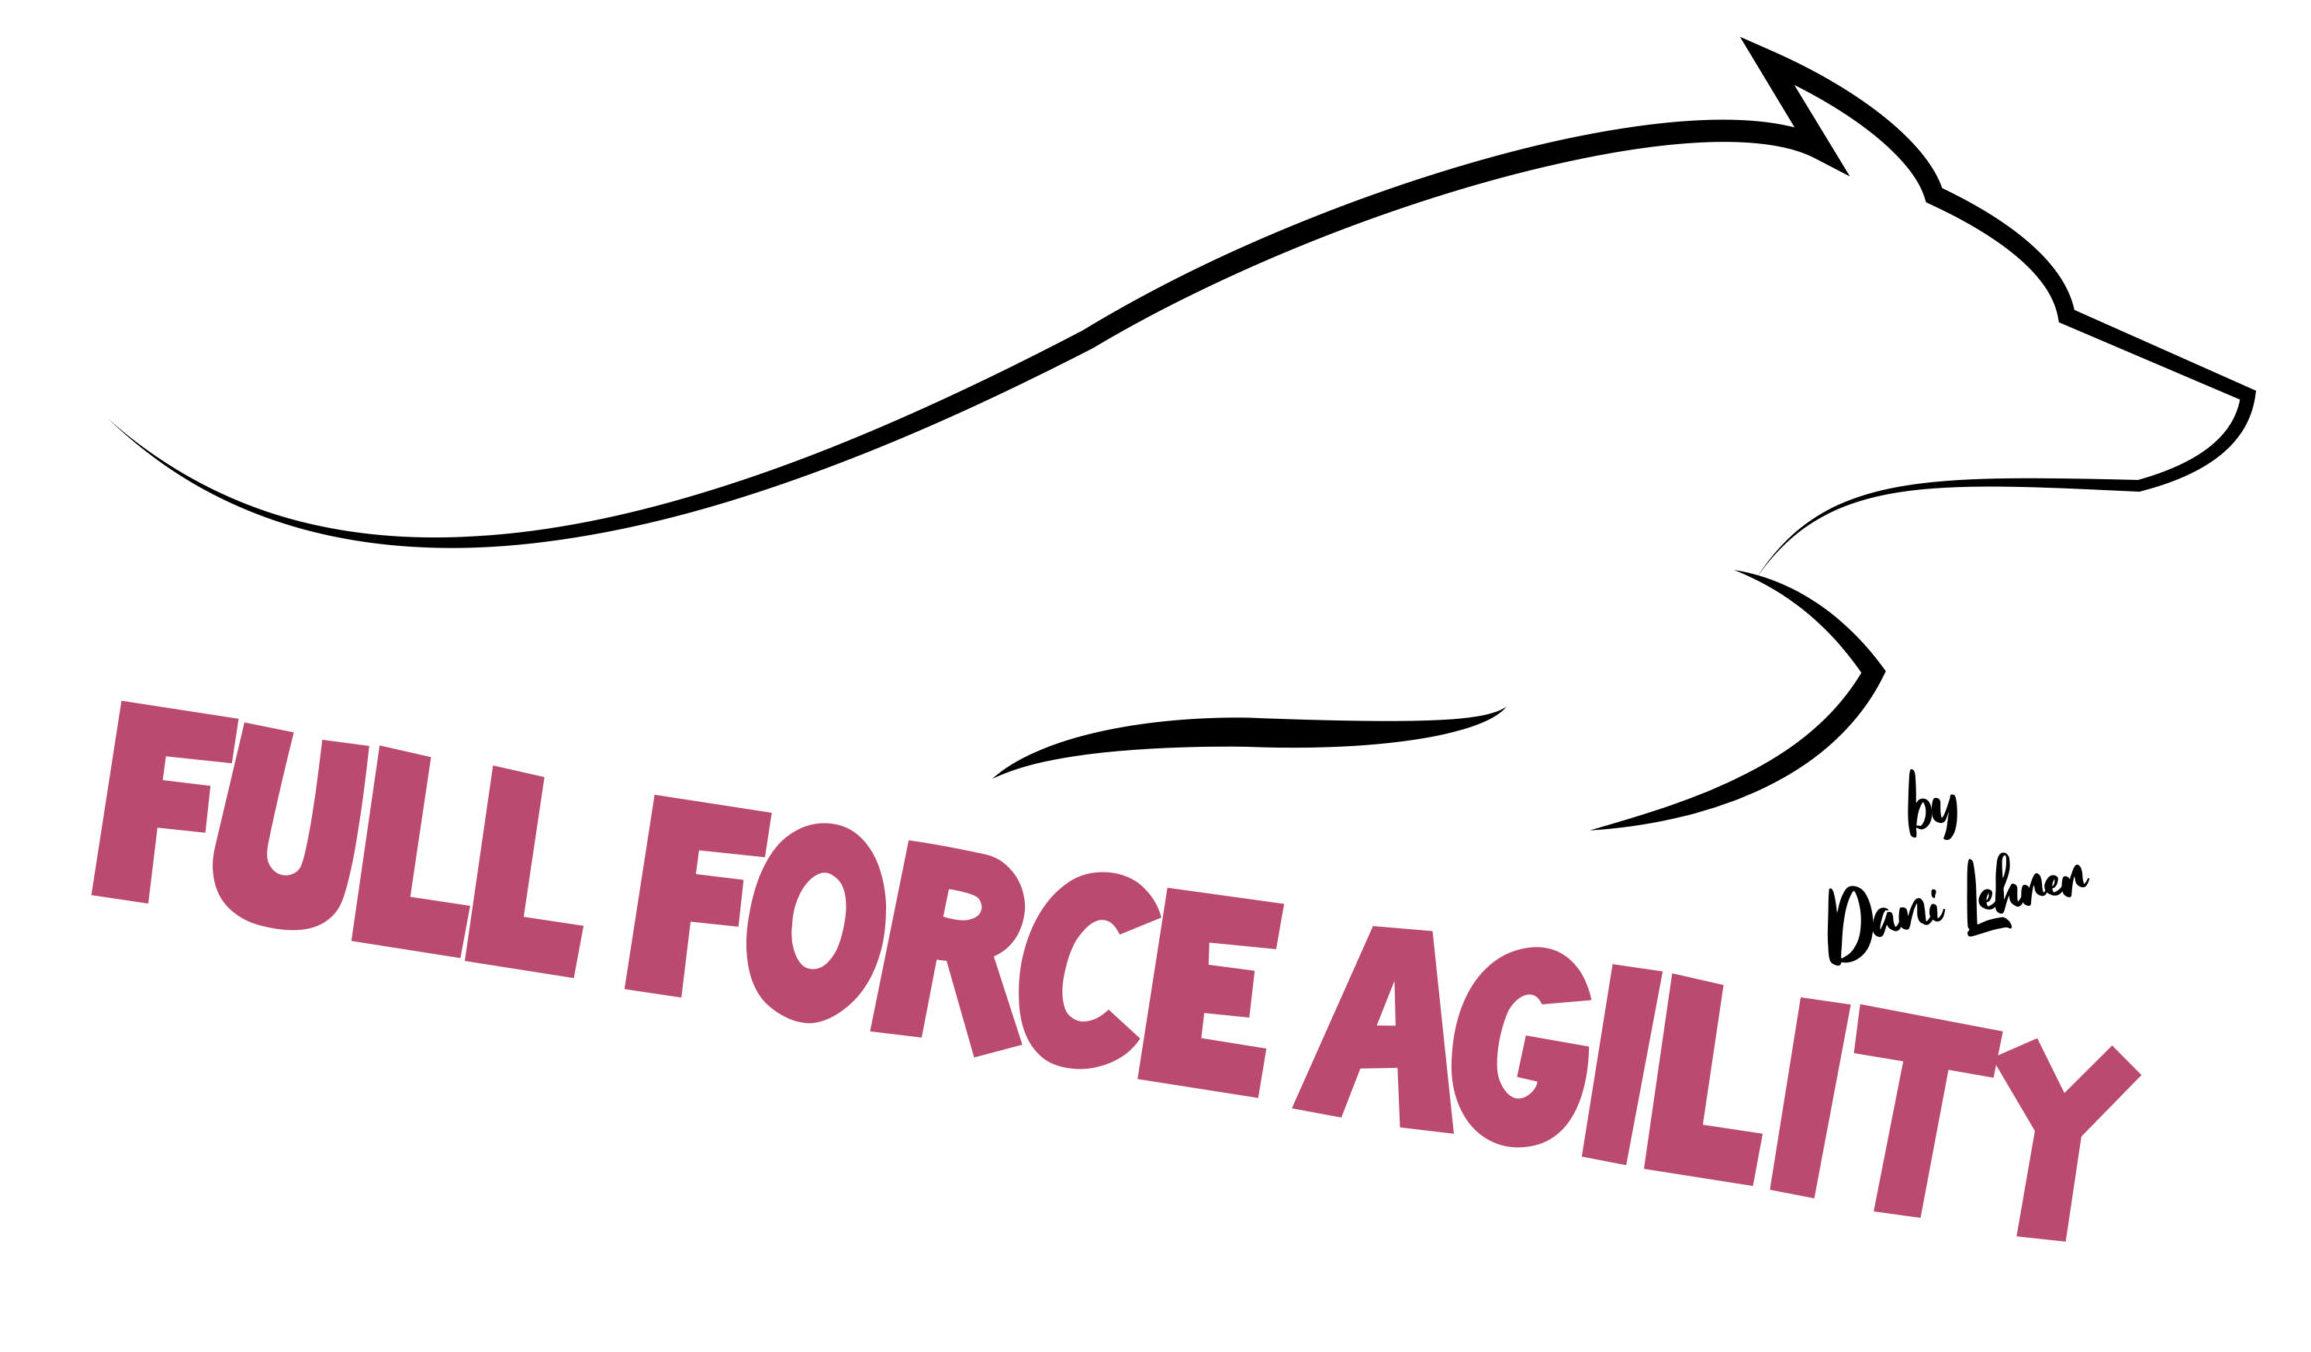 Full Force Agility